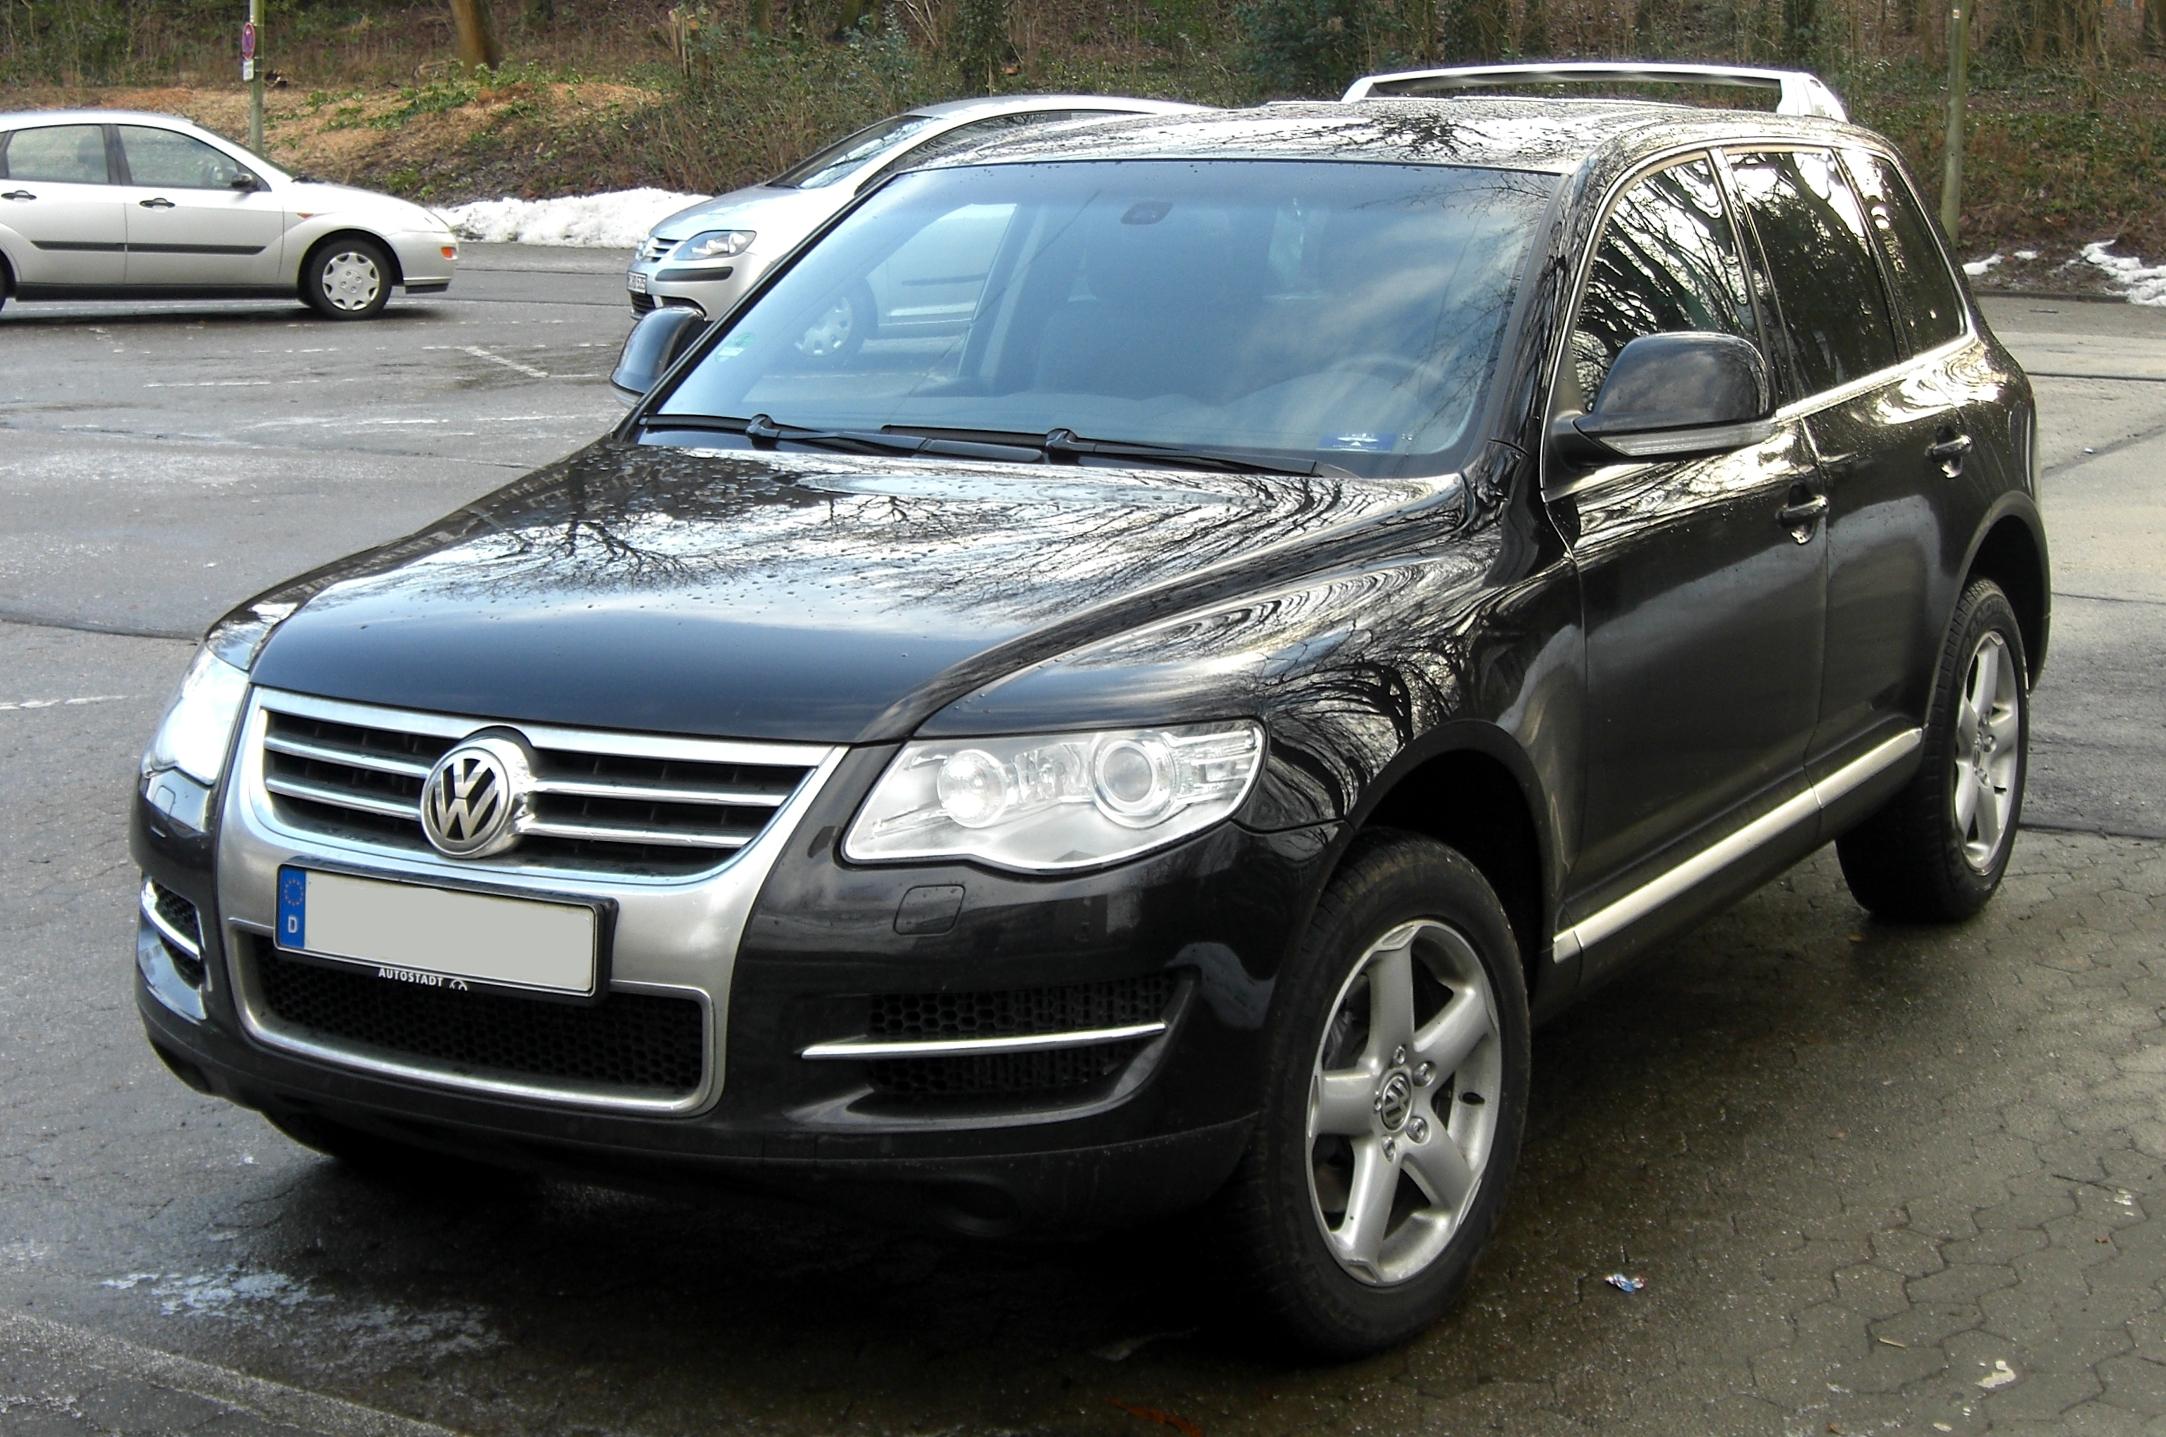 File:VW Touareg front.JPG - Wikimedia Commons